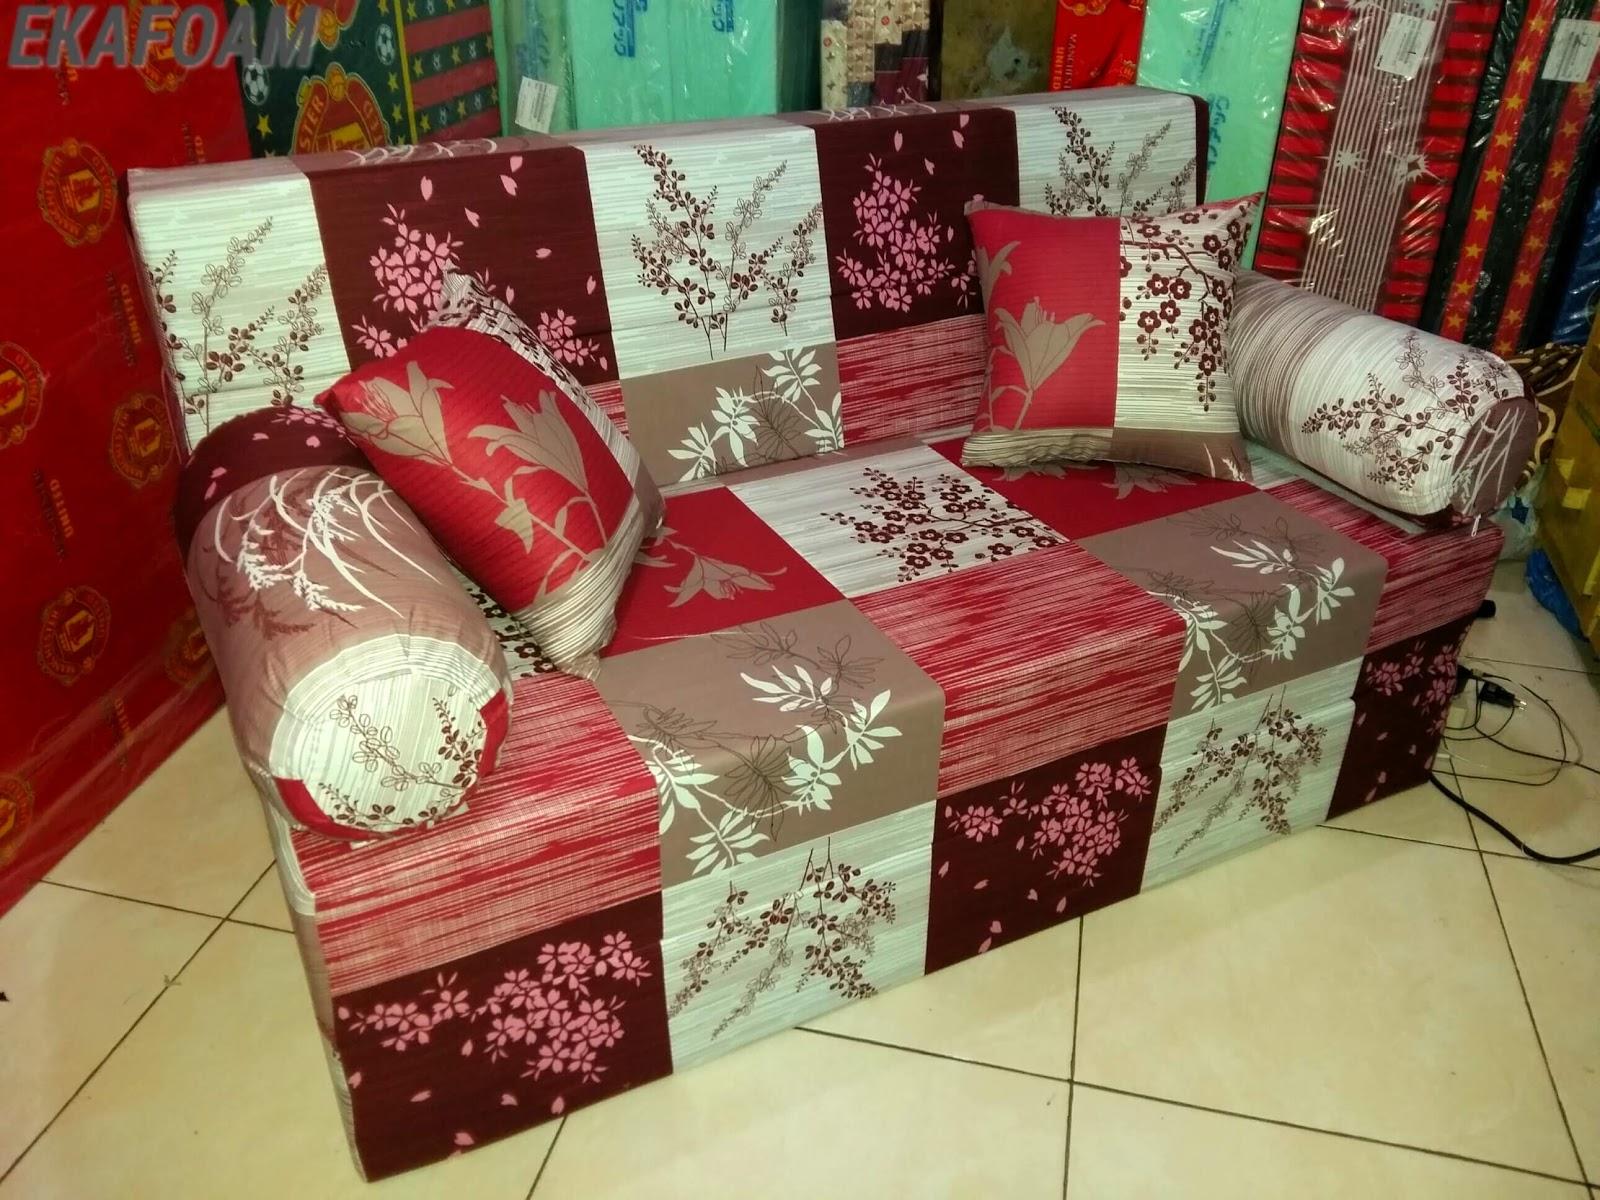 sofa bed inoac 3 in 1 high end leather reclining 2017 full motif agen resmi kasur busa